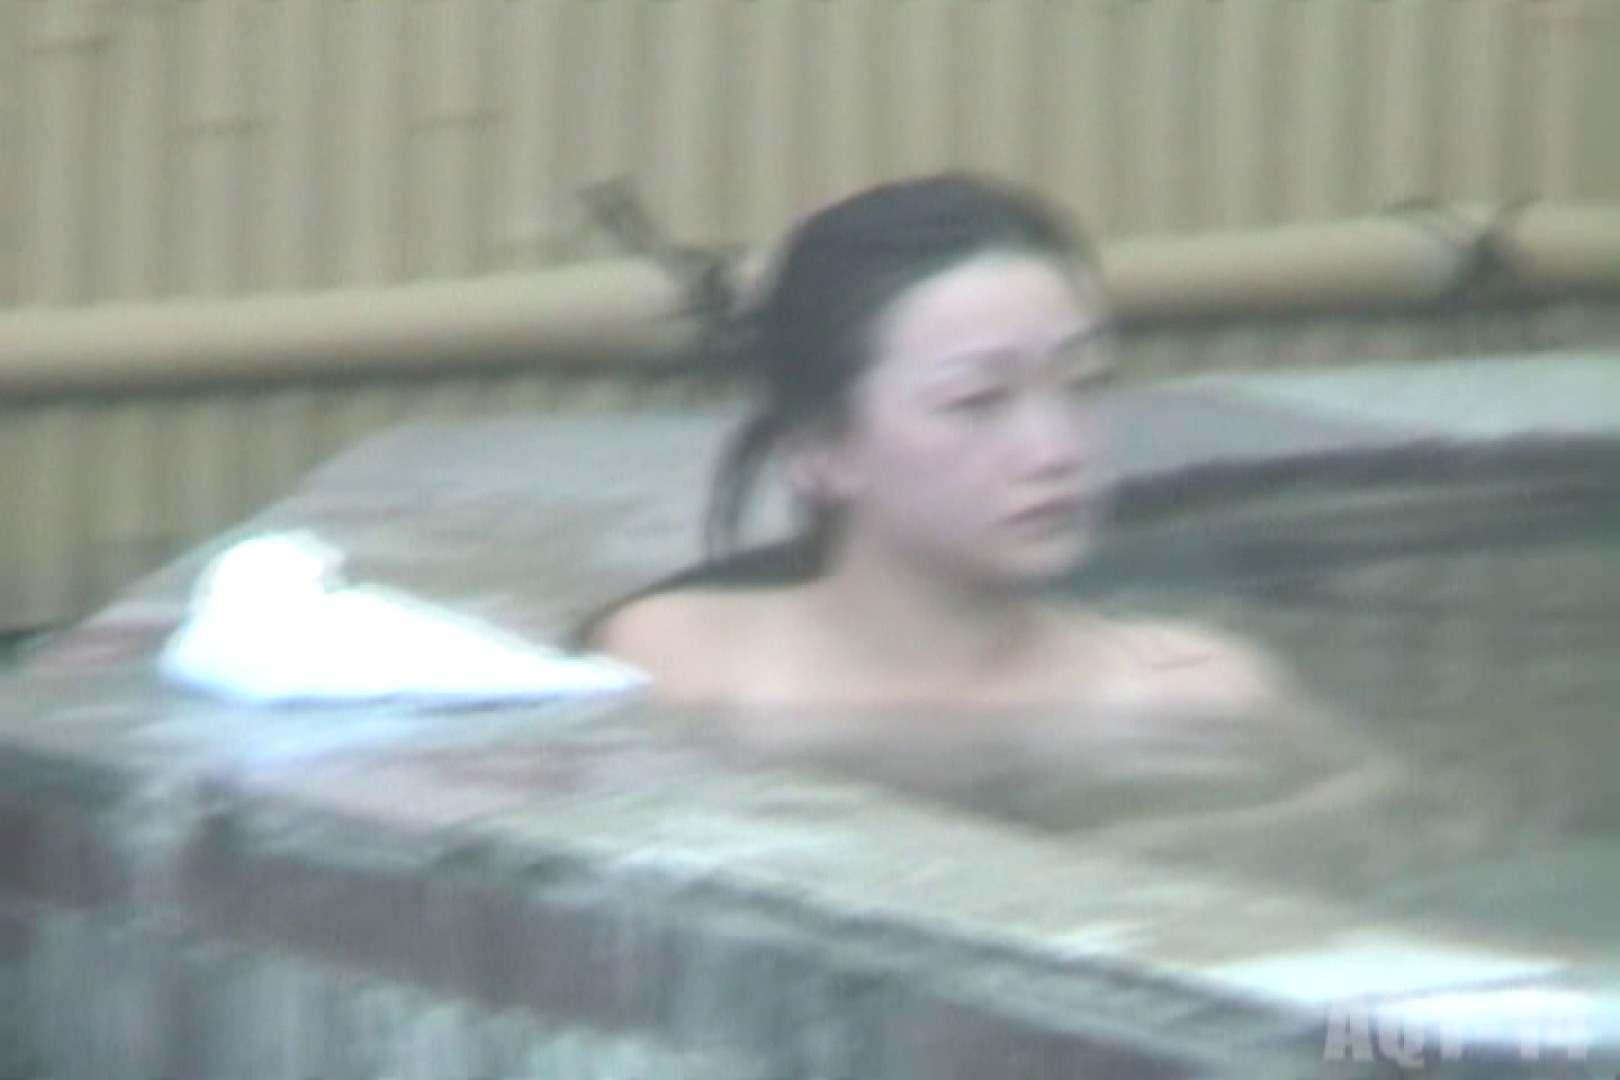 Aquaな露天風呂Vol.826 盗撮  84連発 30